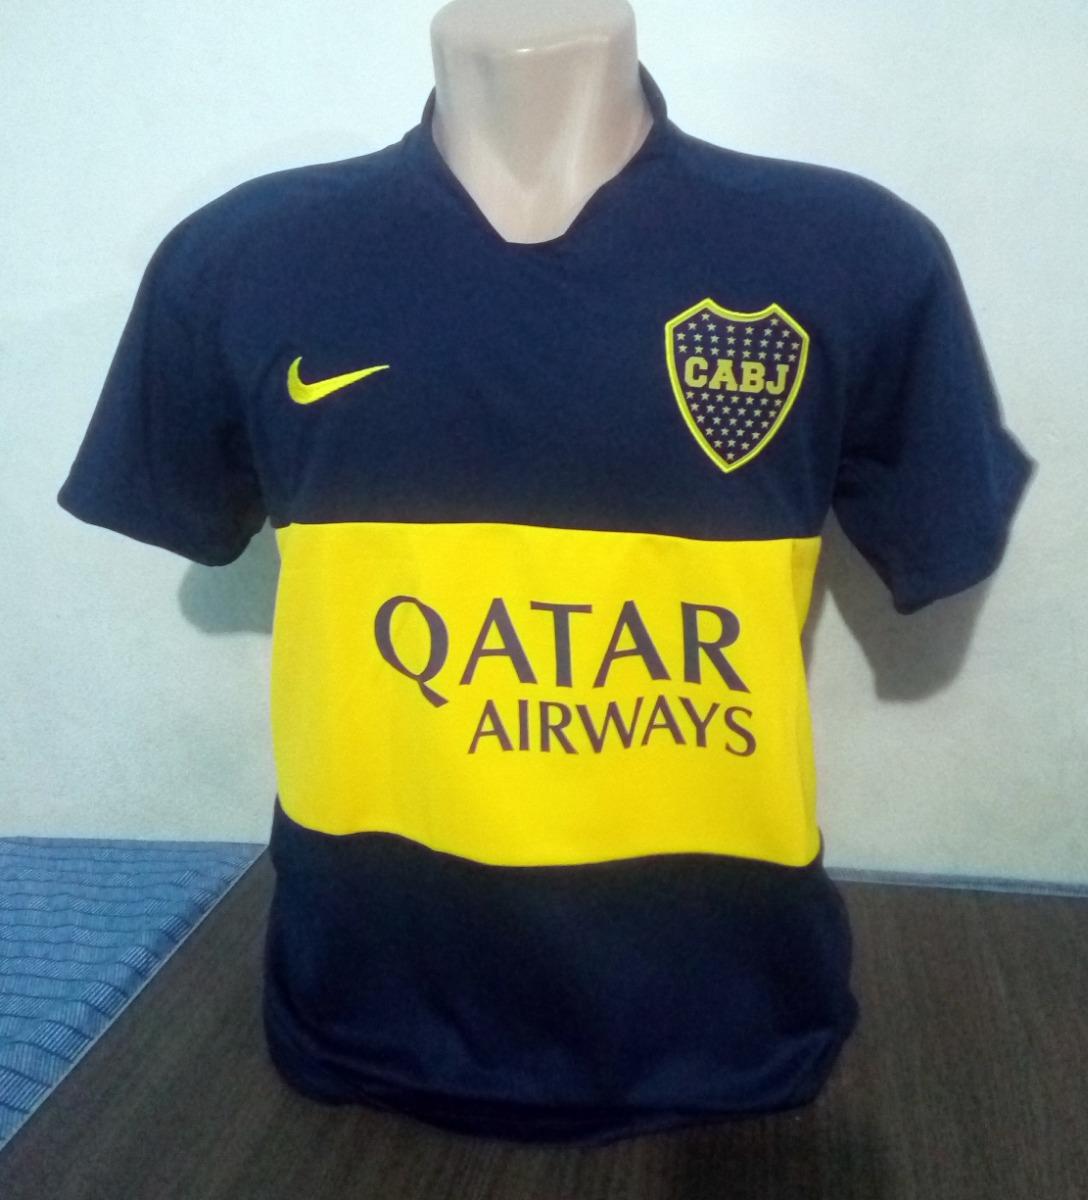 camisa boca juniors 2018 - 2019 supporter torcedor. Carregando zoom. 277271defed87